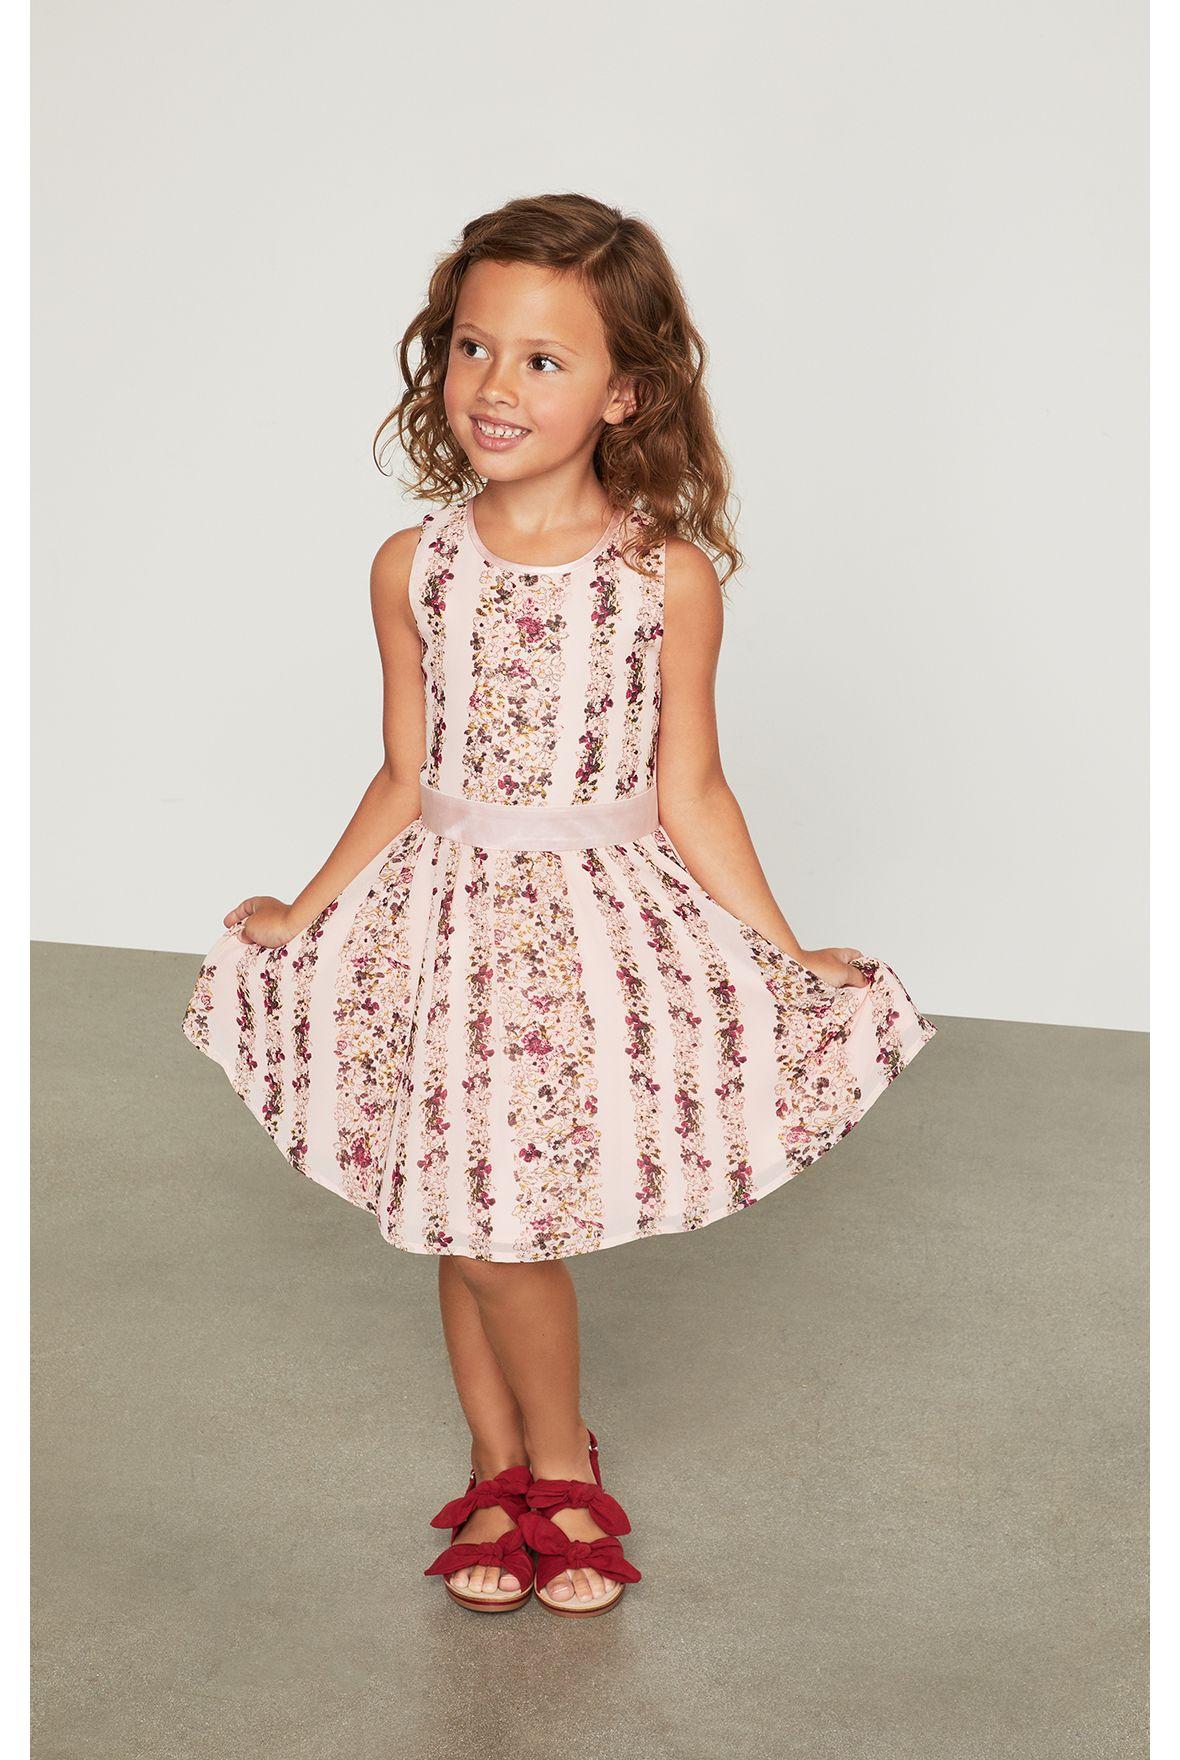 Vestido-BCBGirls-rosa-con-flores-B638DR205_RPL_c